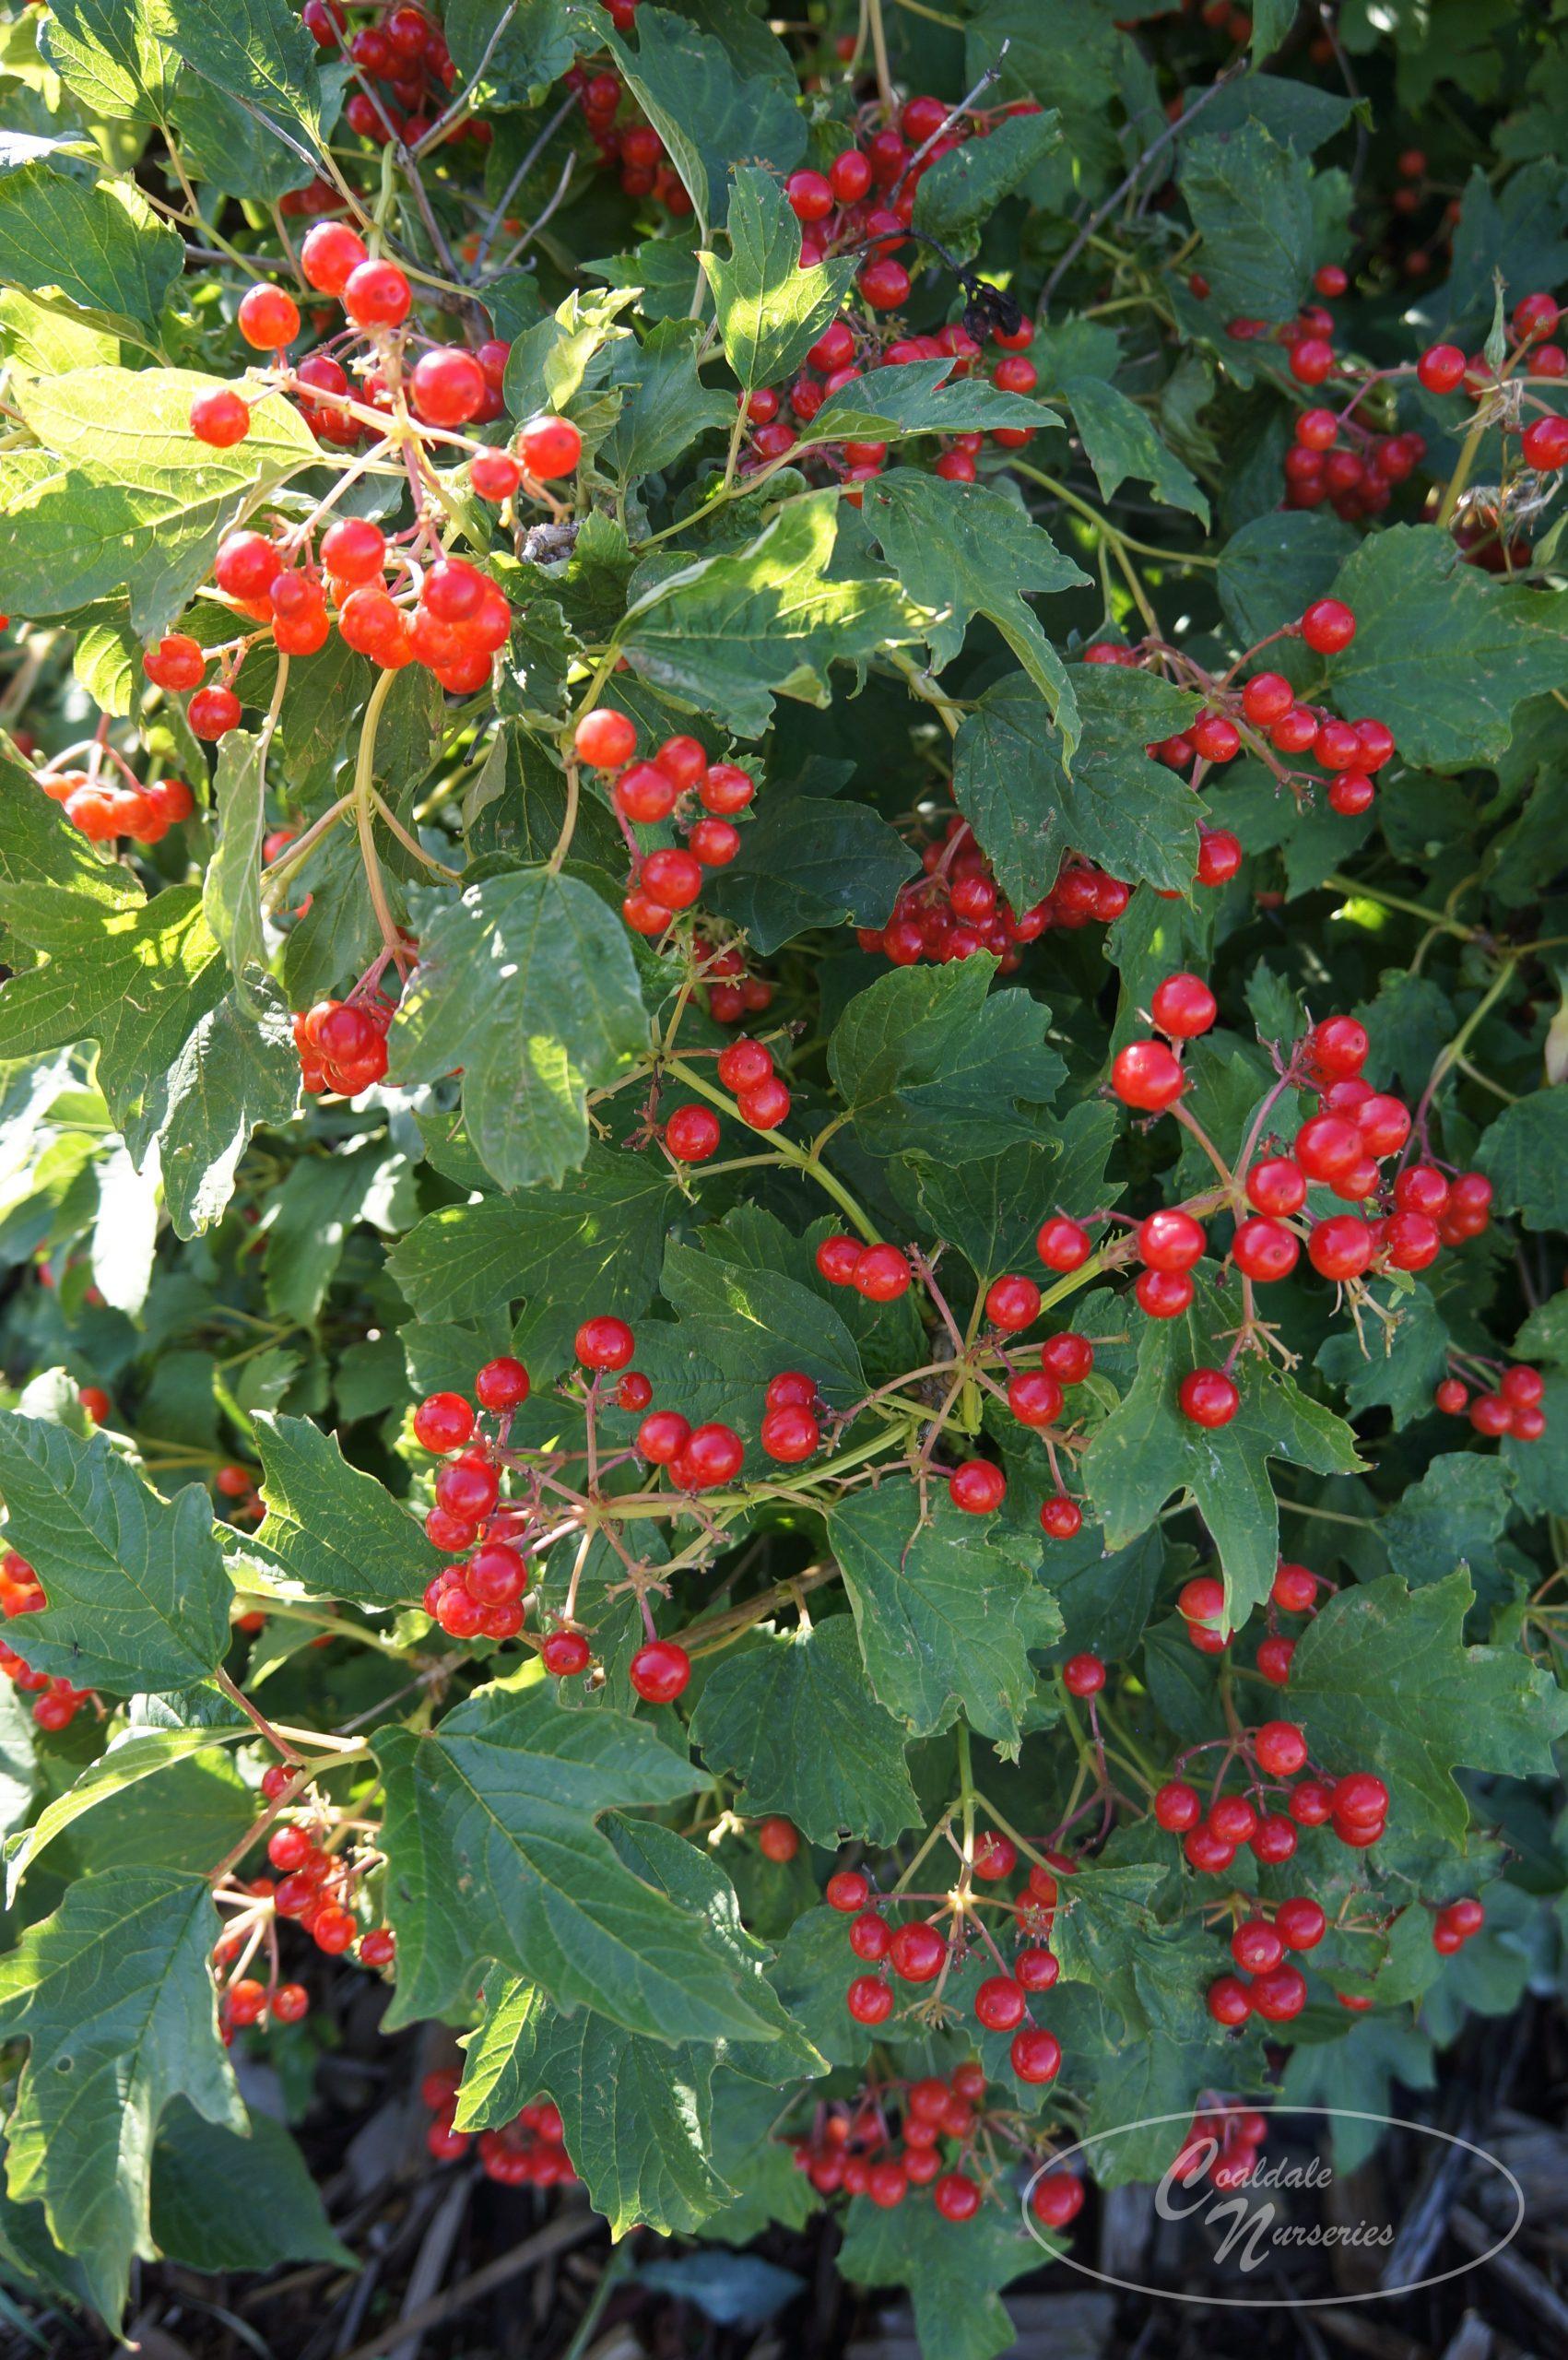 American Highbush Cranberry Image